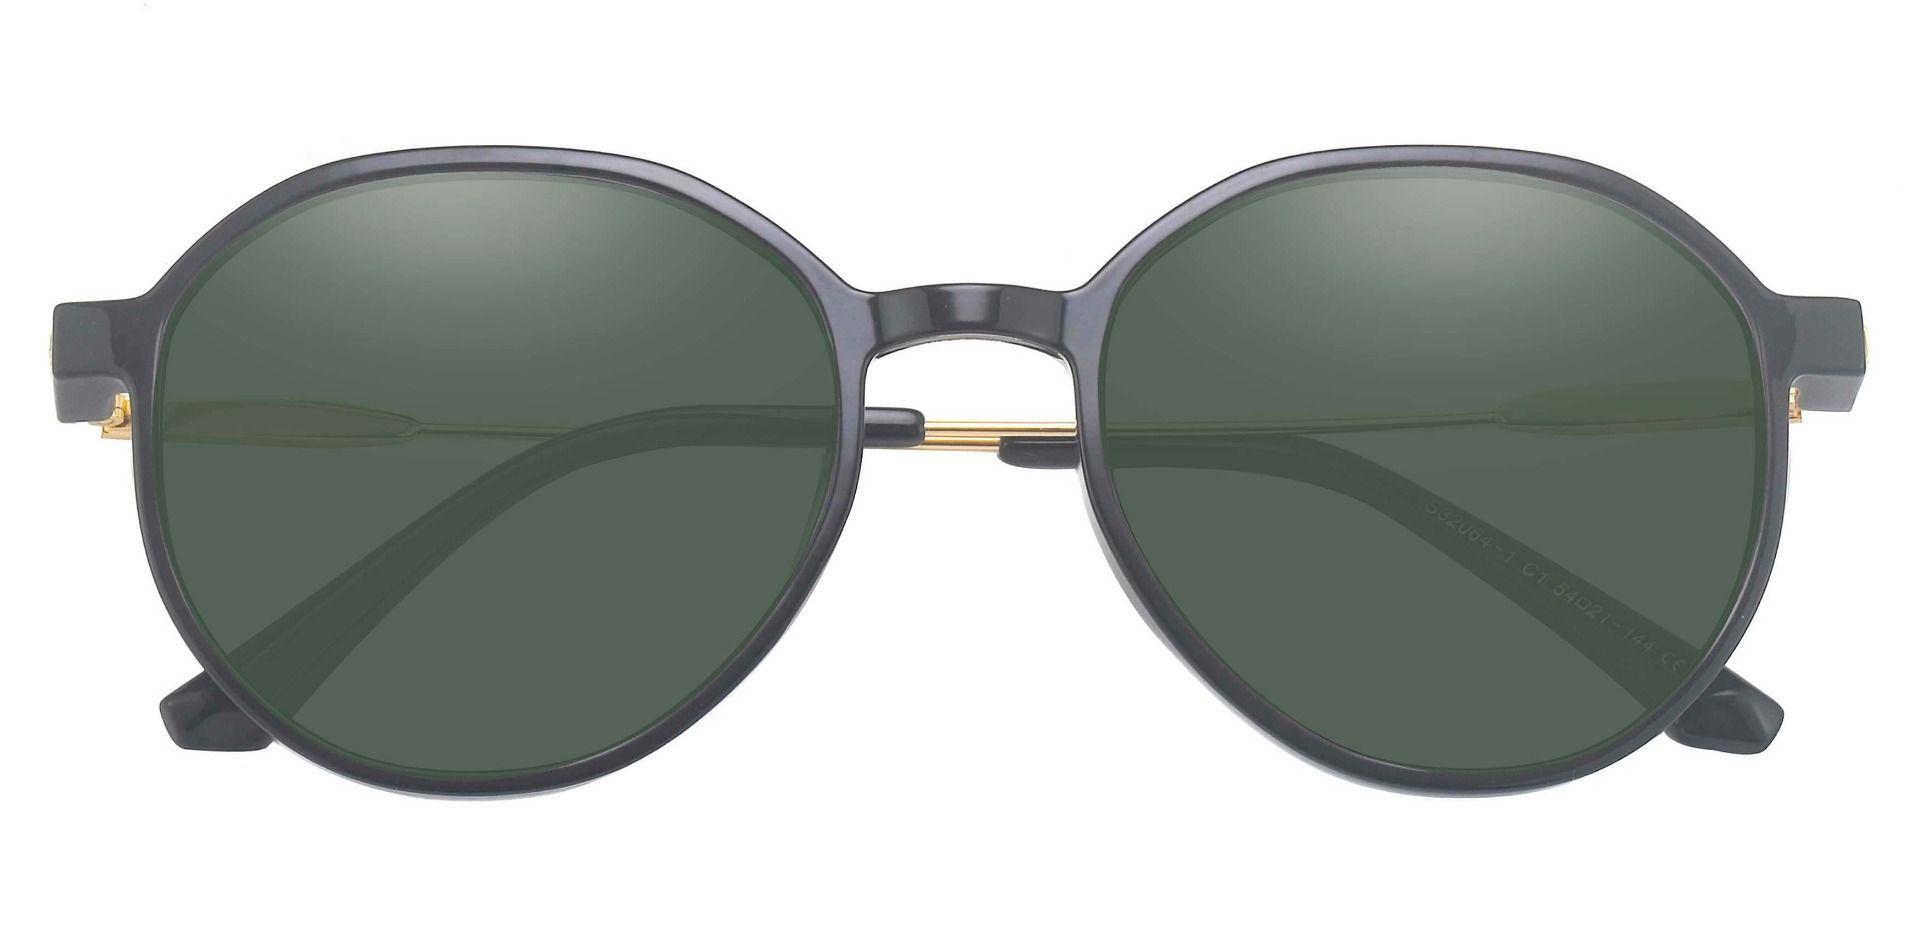 Daytona Geometric Prescription Sunglasses - Black Frame With Green Lenses